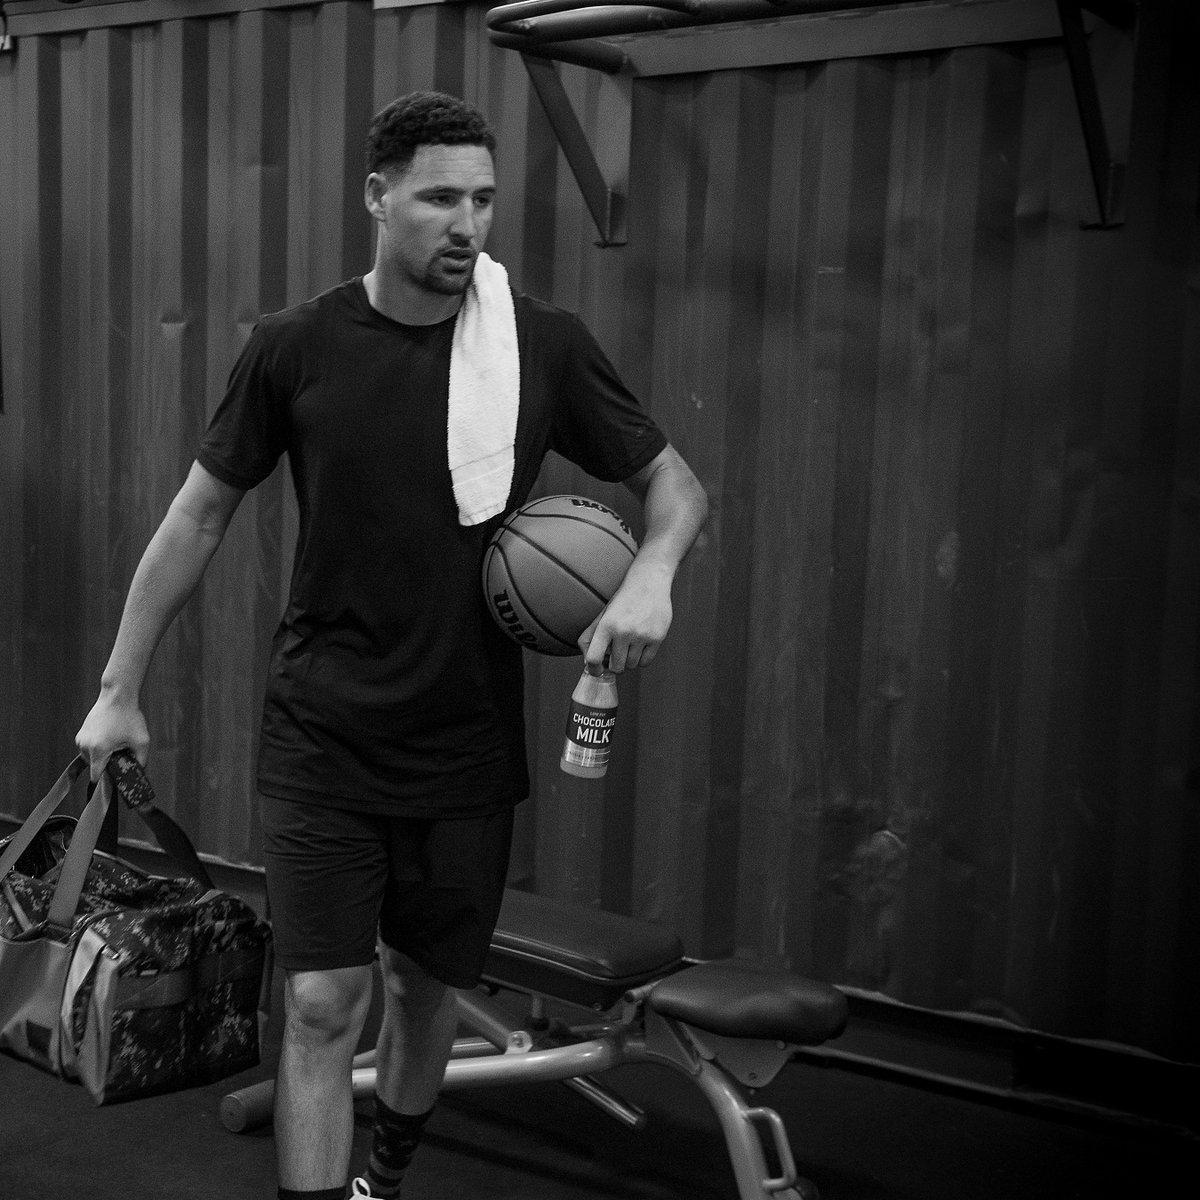 ad RT @KlayThompson: My workout...